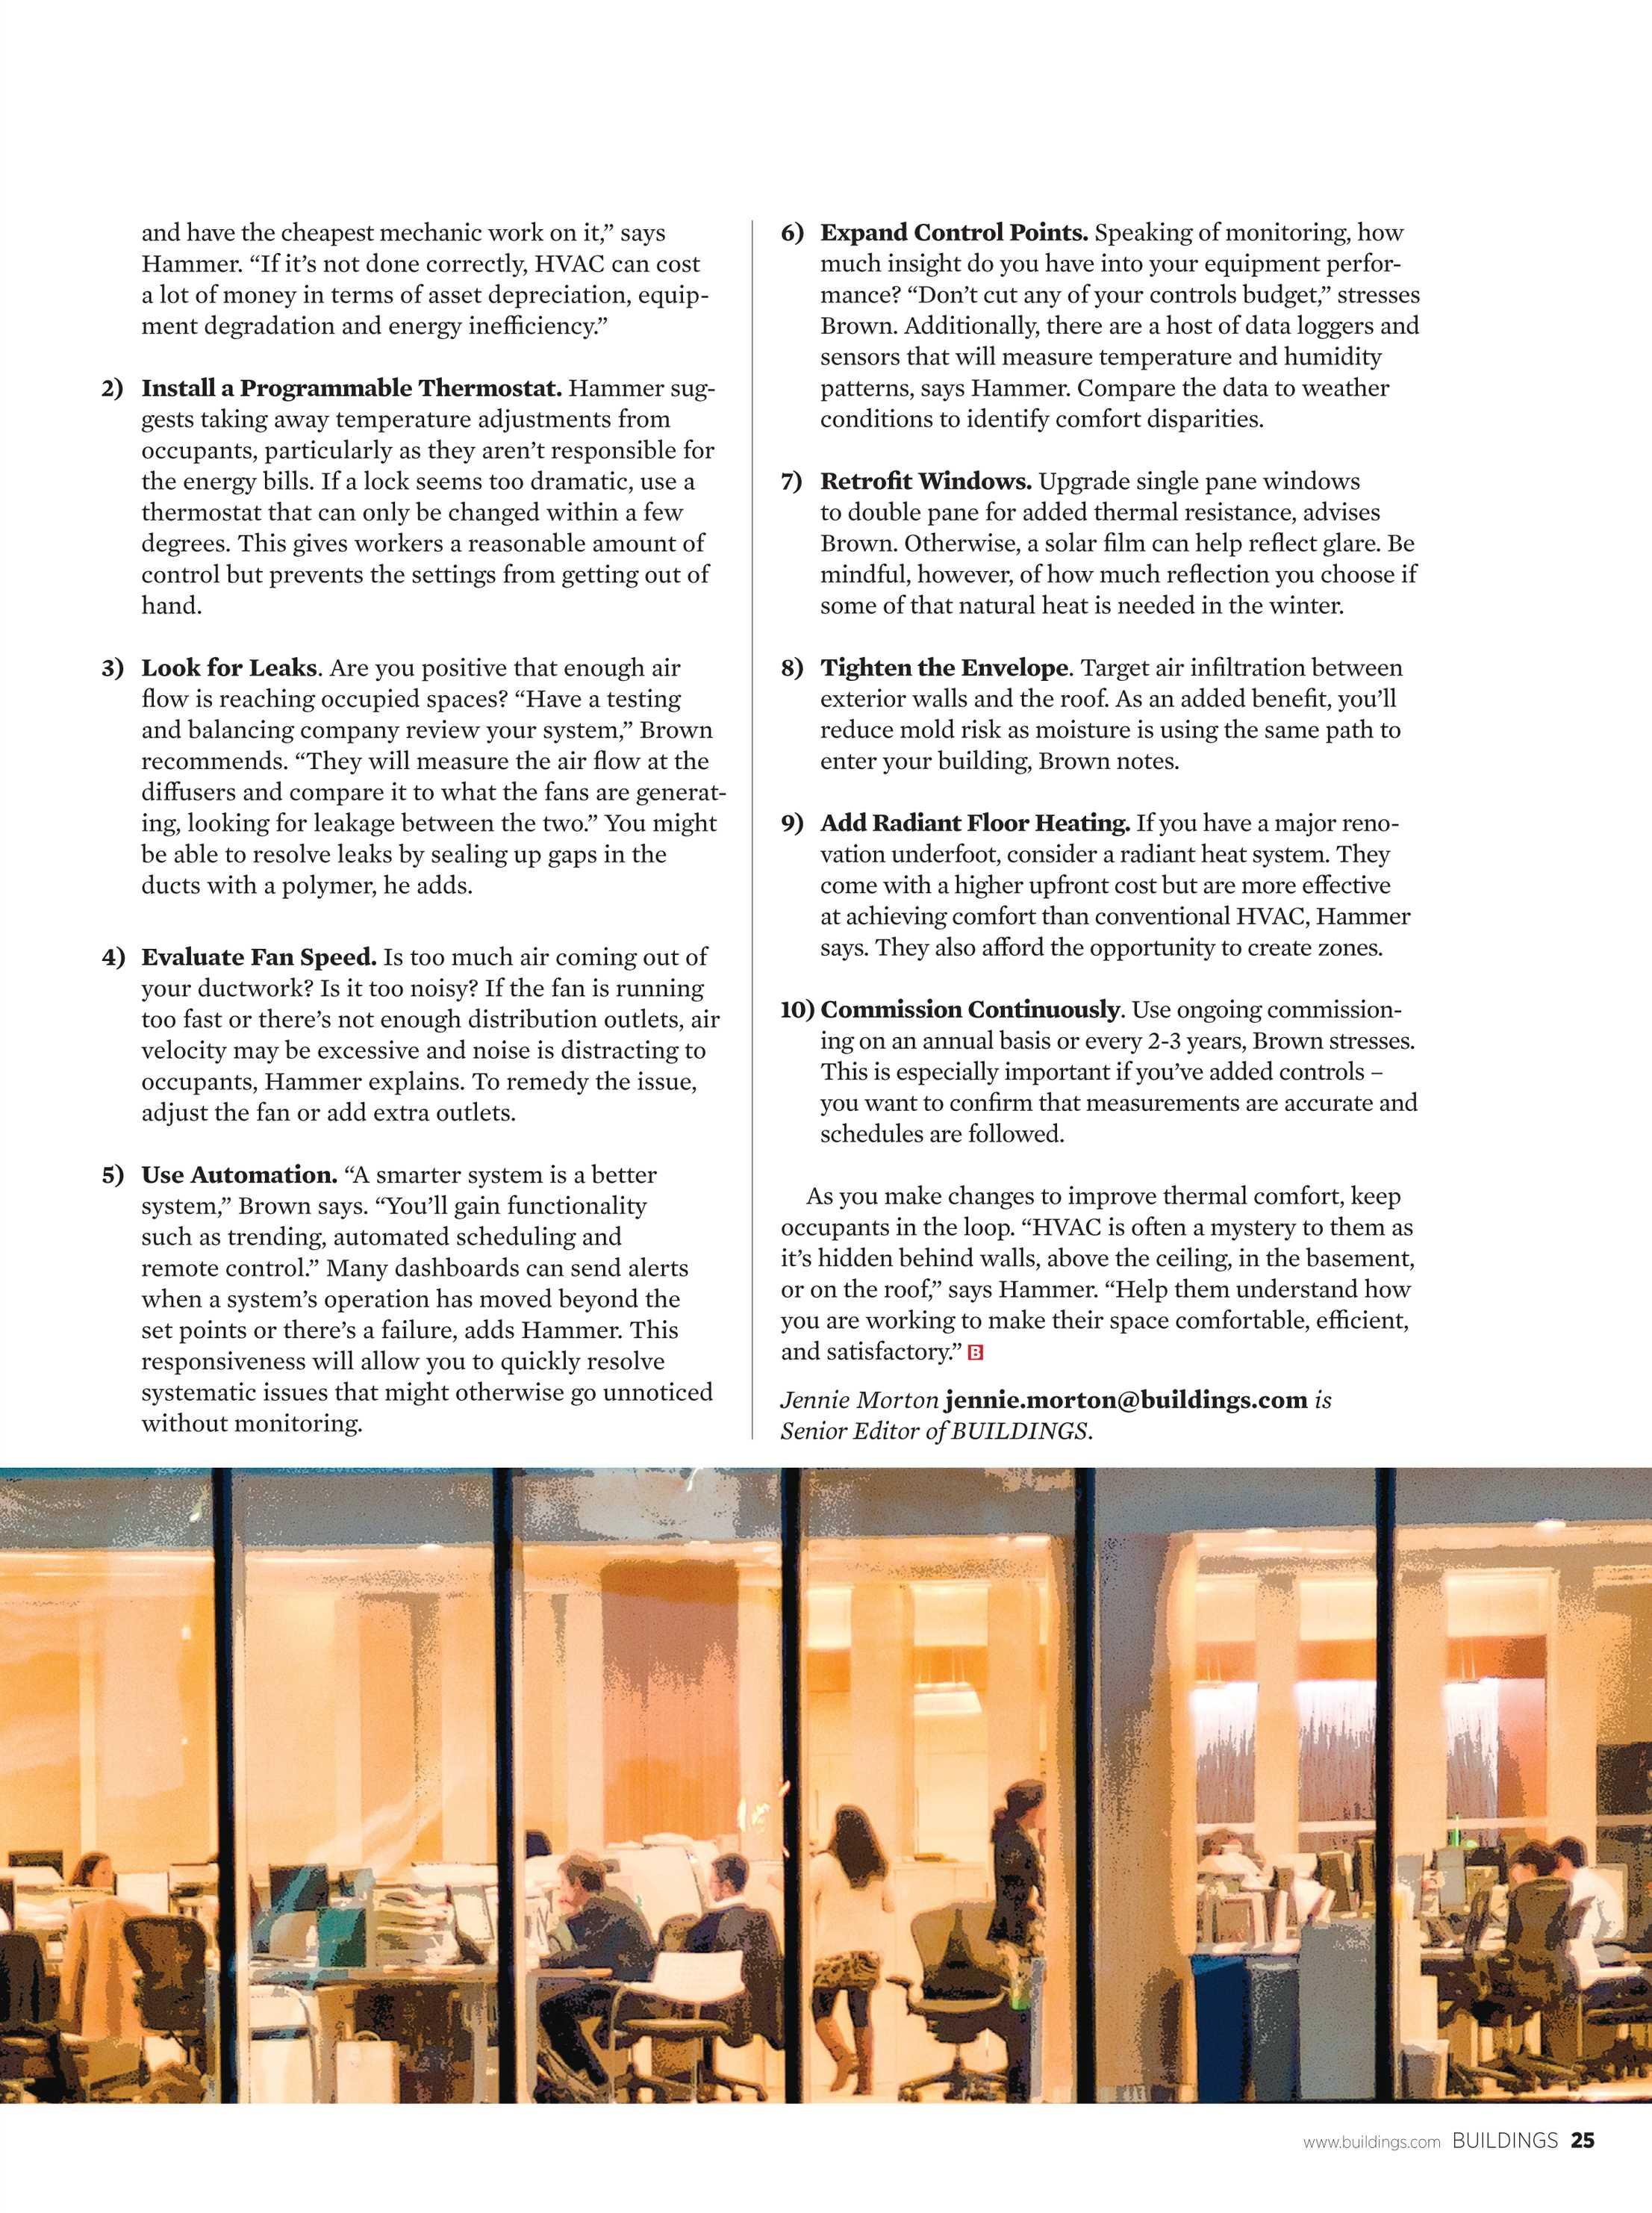 Buildings Magazine - January 2016 - page 25